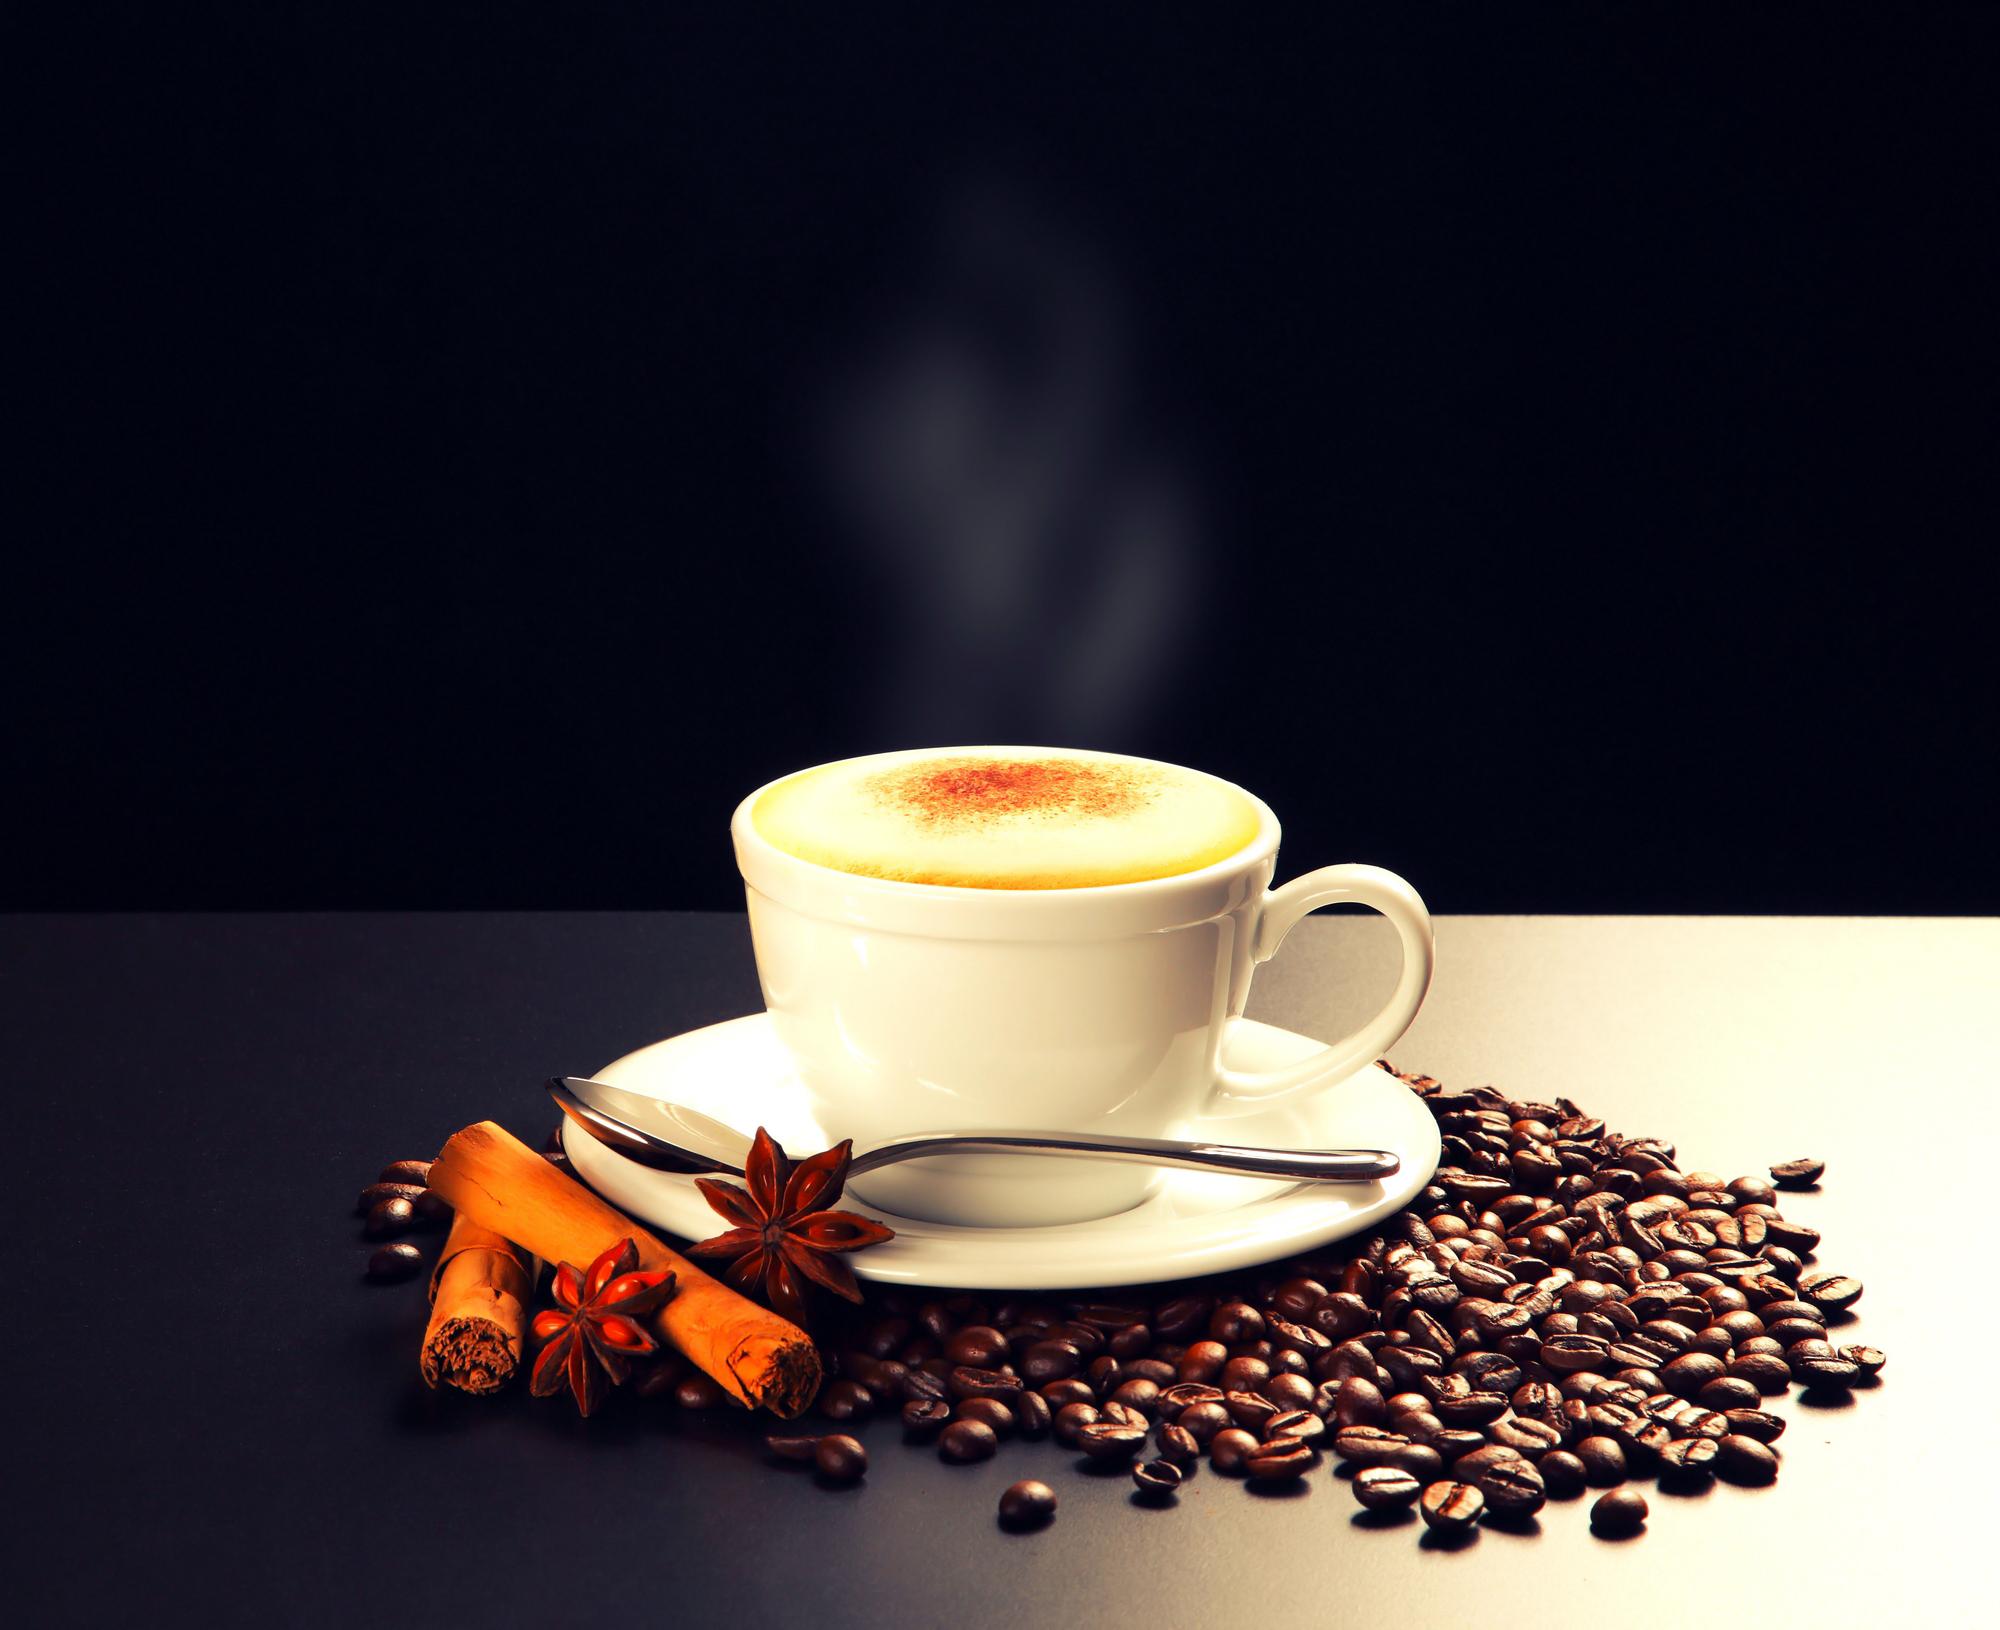 сорт считается чай кофе фотообои вотермарк пикабу